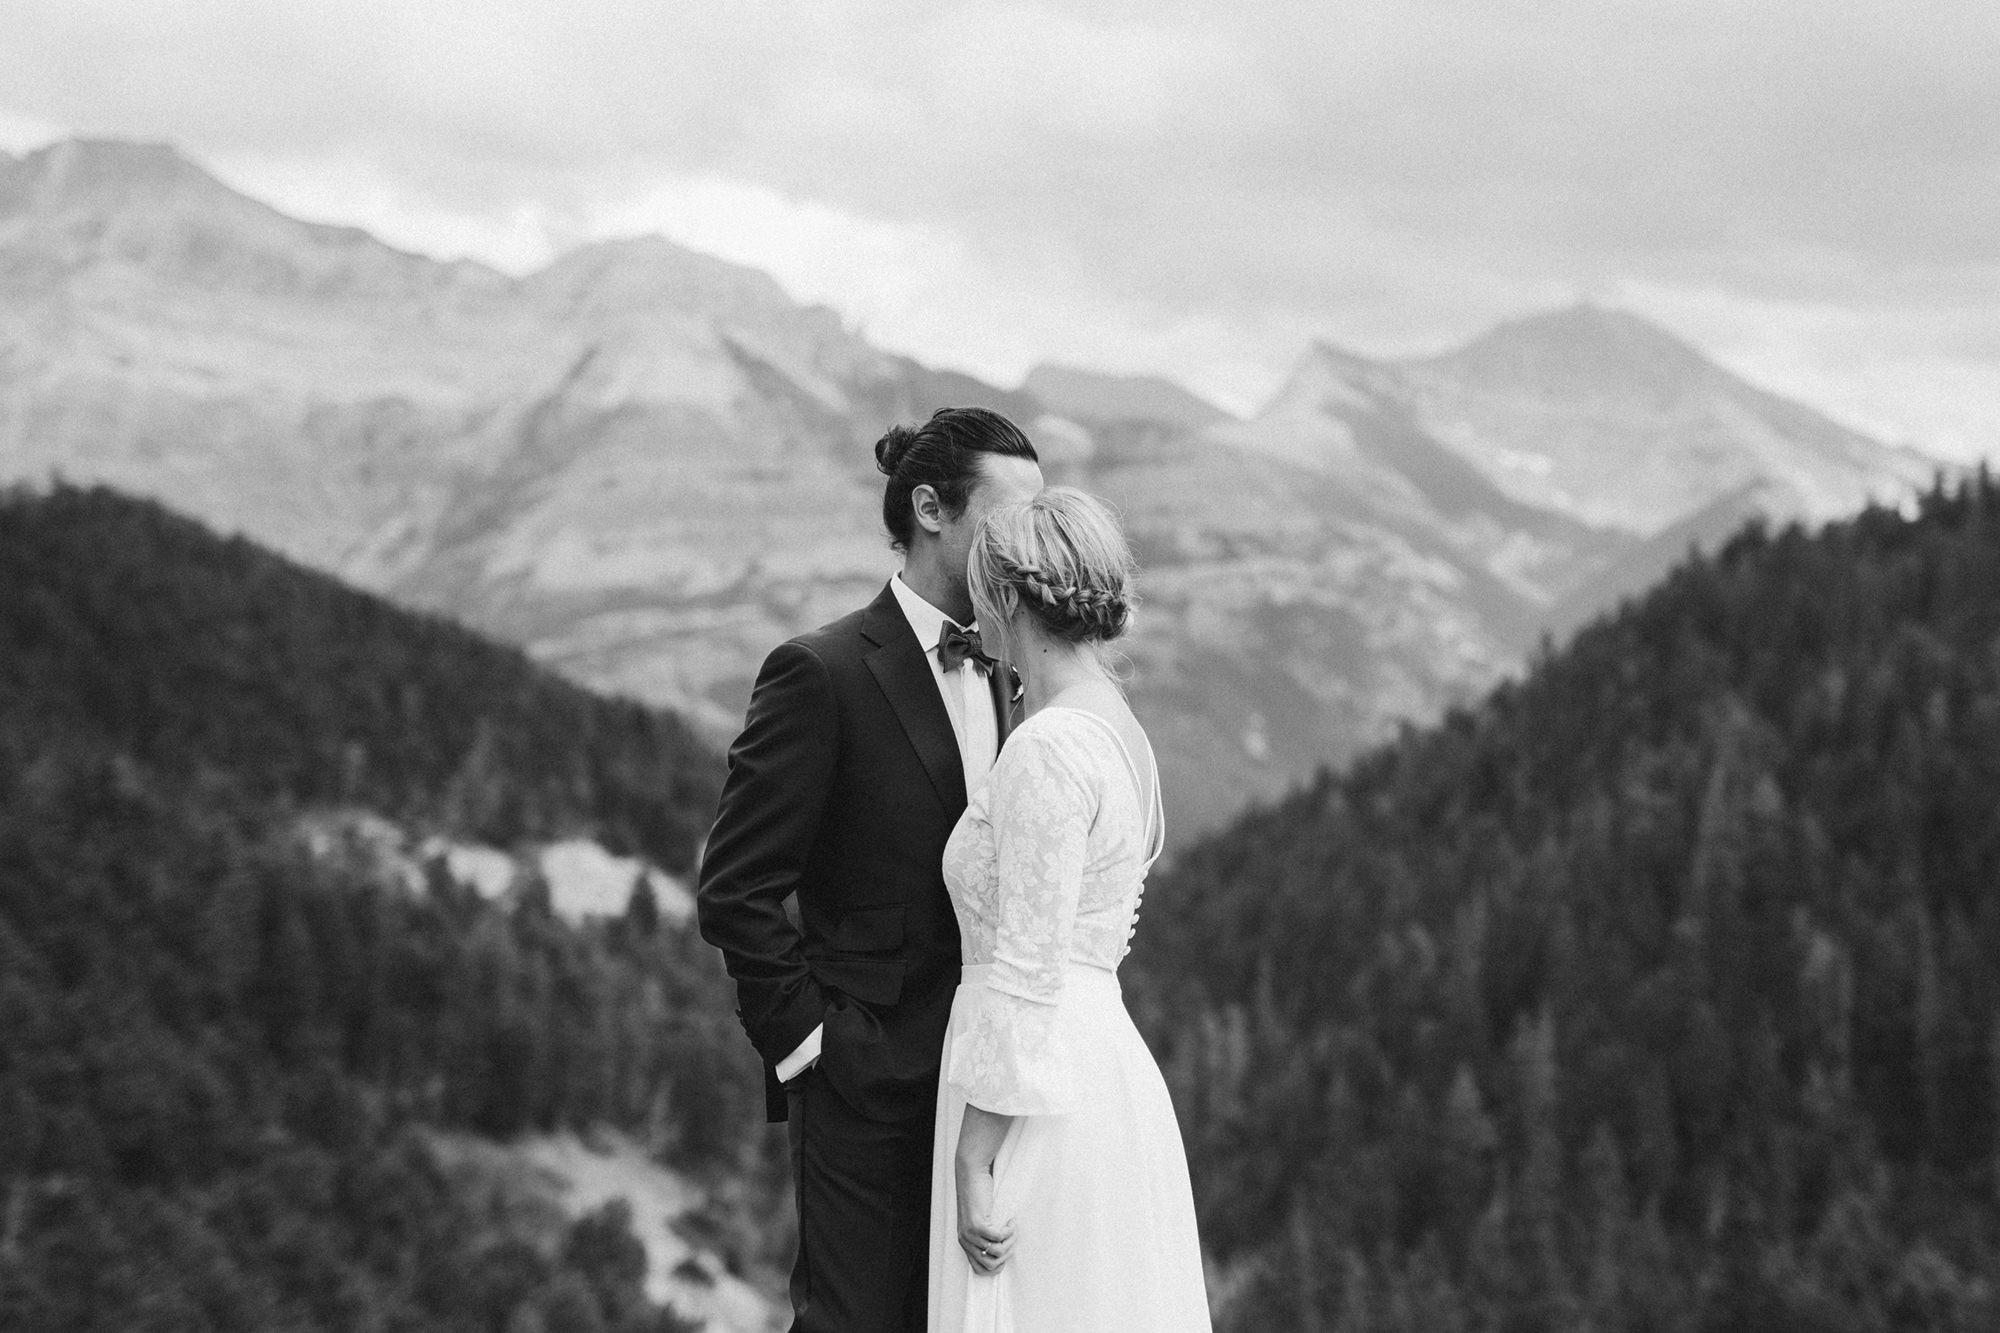 Waterton Wedding David Guenther -24.JPG